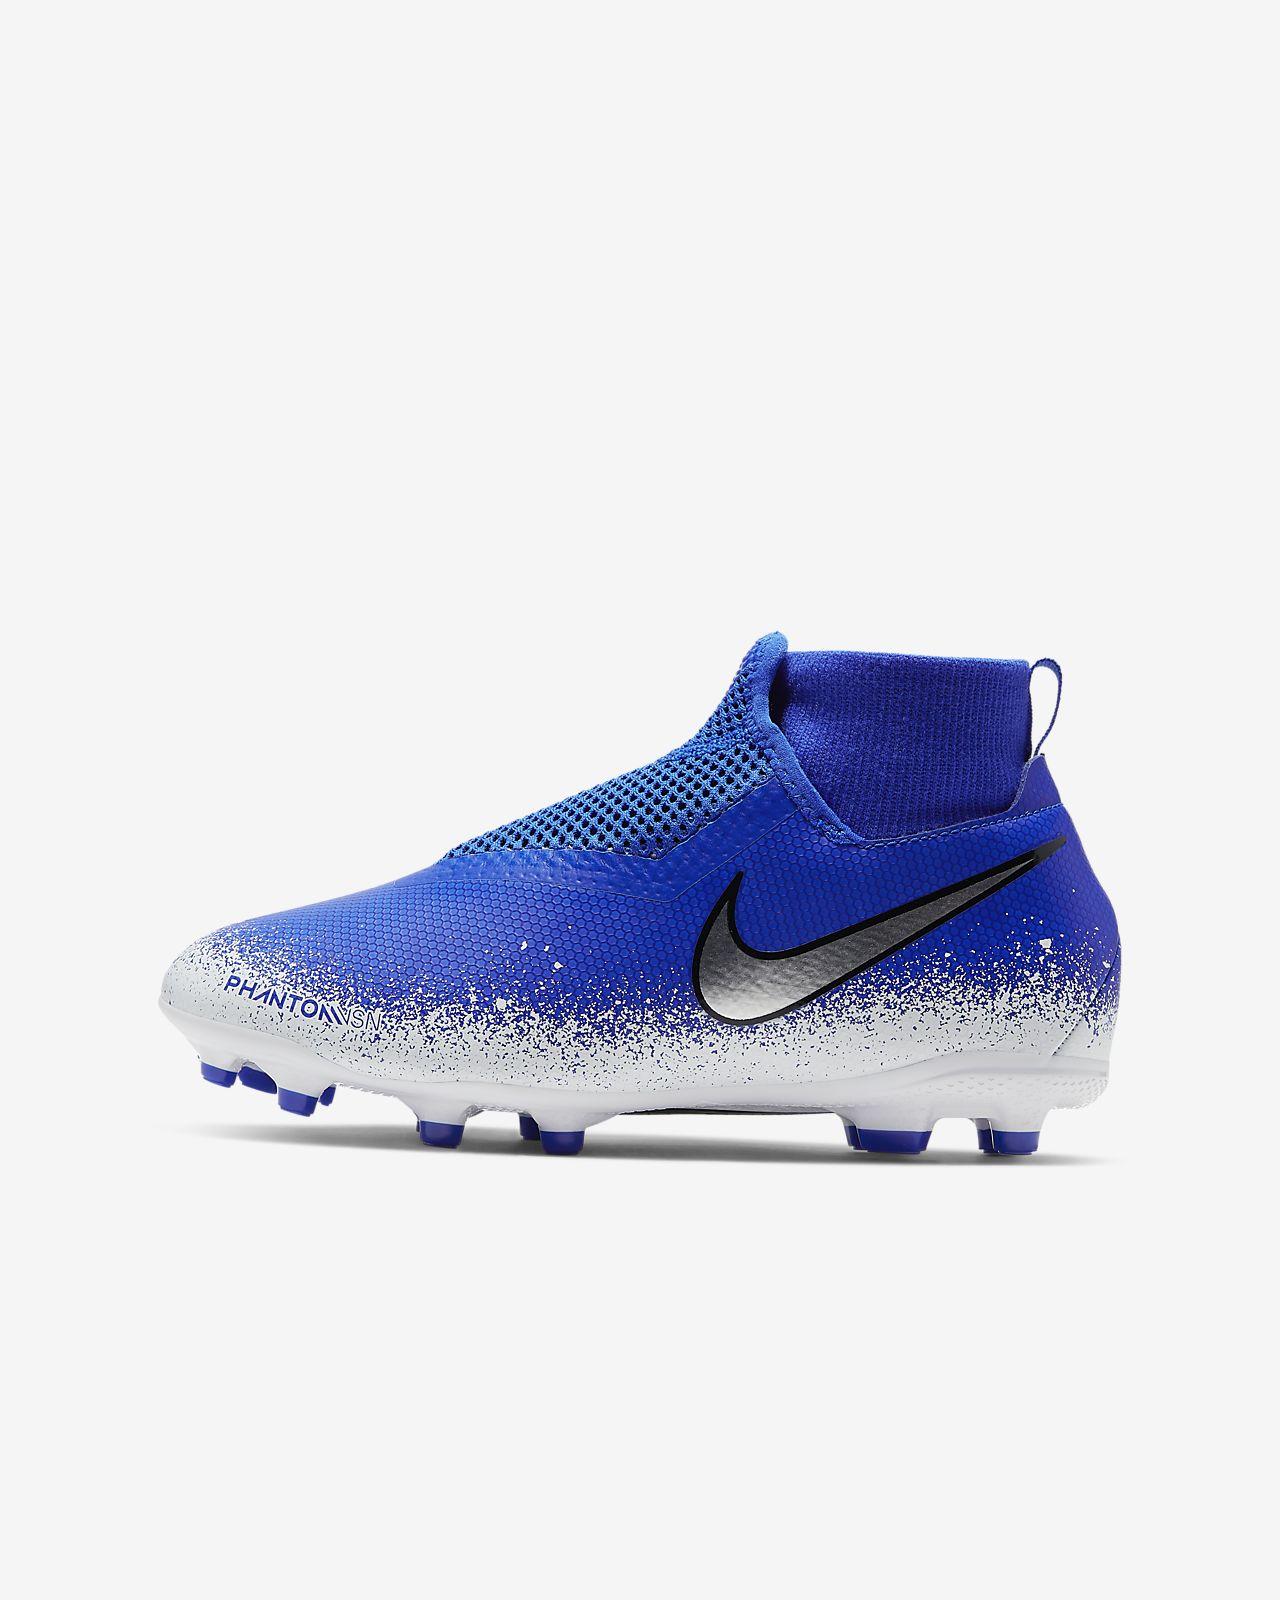 Scarpa da calcio multiterreno Nike Jr. Phantom Vision Academy Dynamic Fit MG - Bambini/Ragazzi